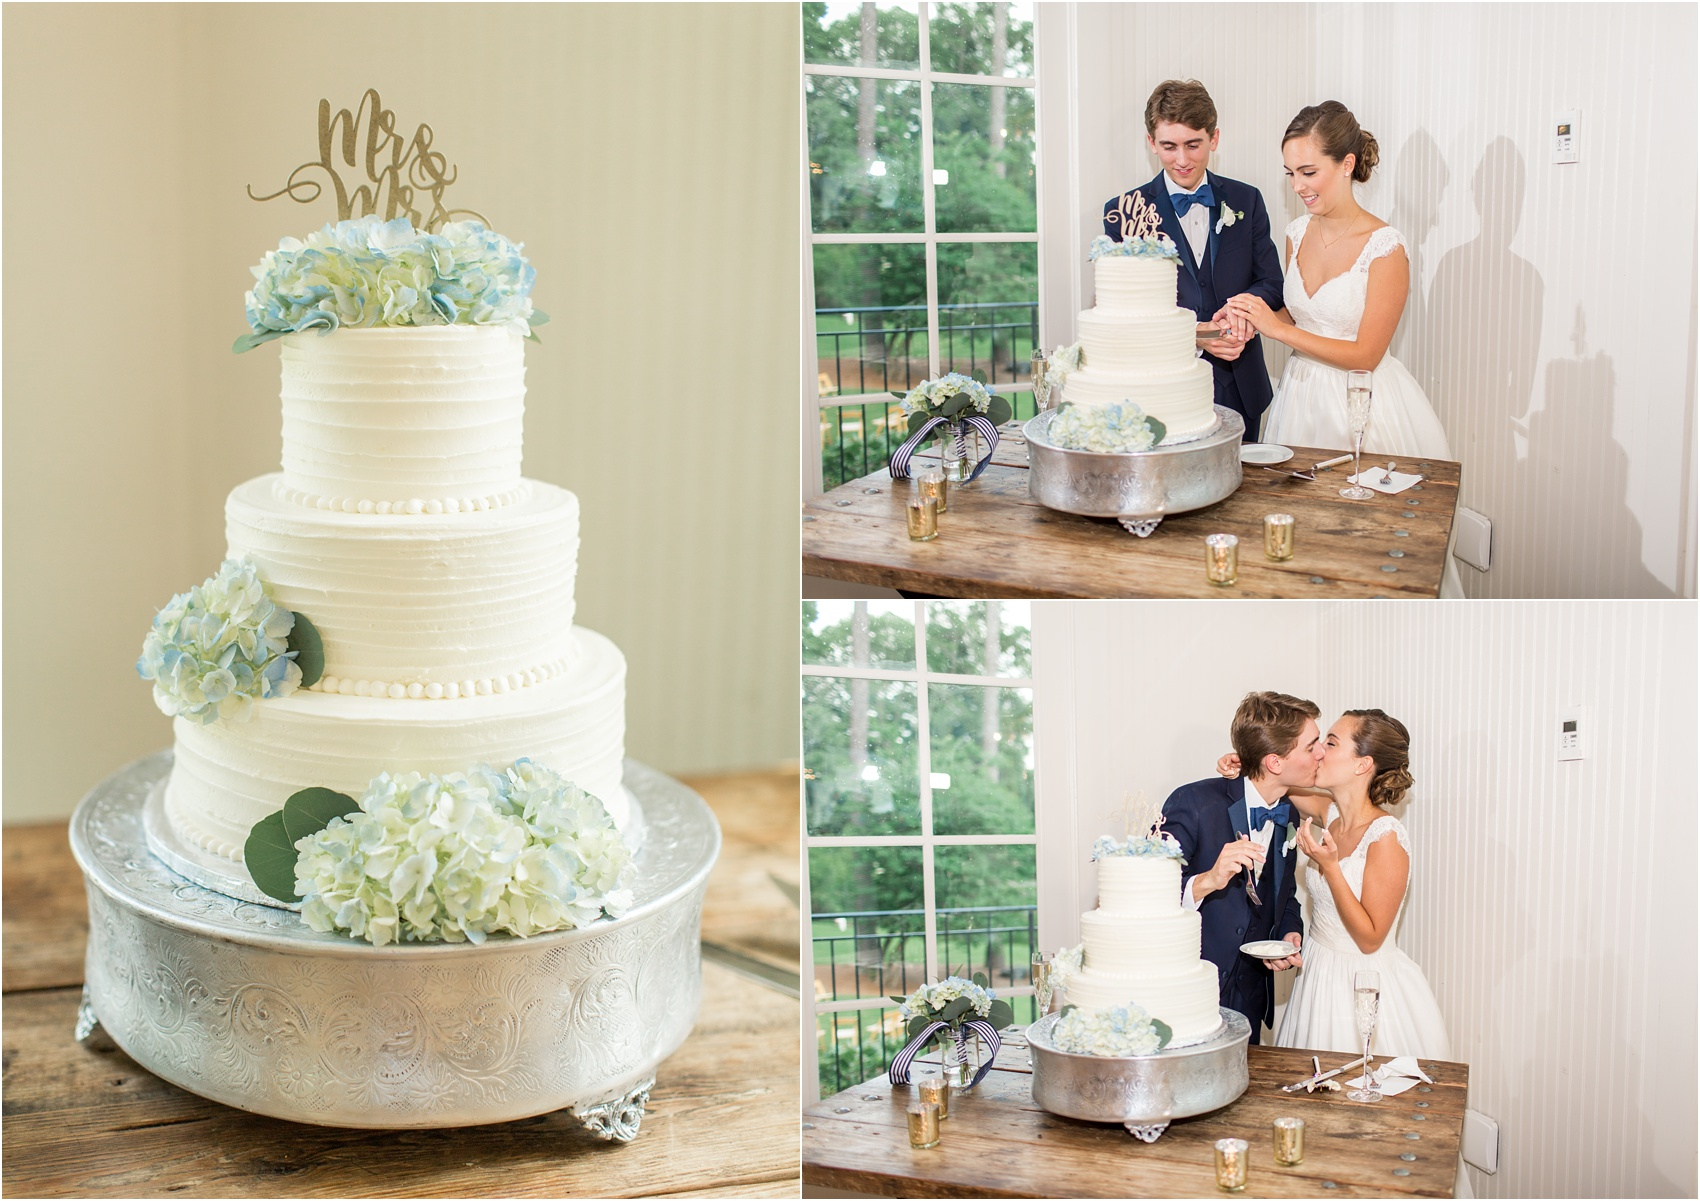 Savannah Eve Photography- Sigl-Adams Wedding- Sneak Peek-29.jpg